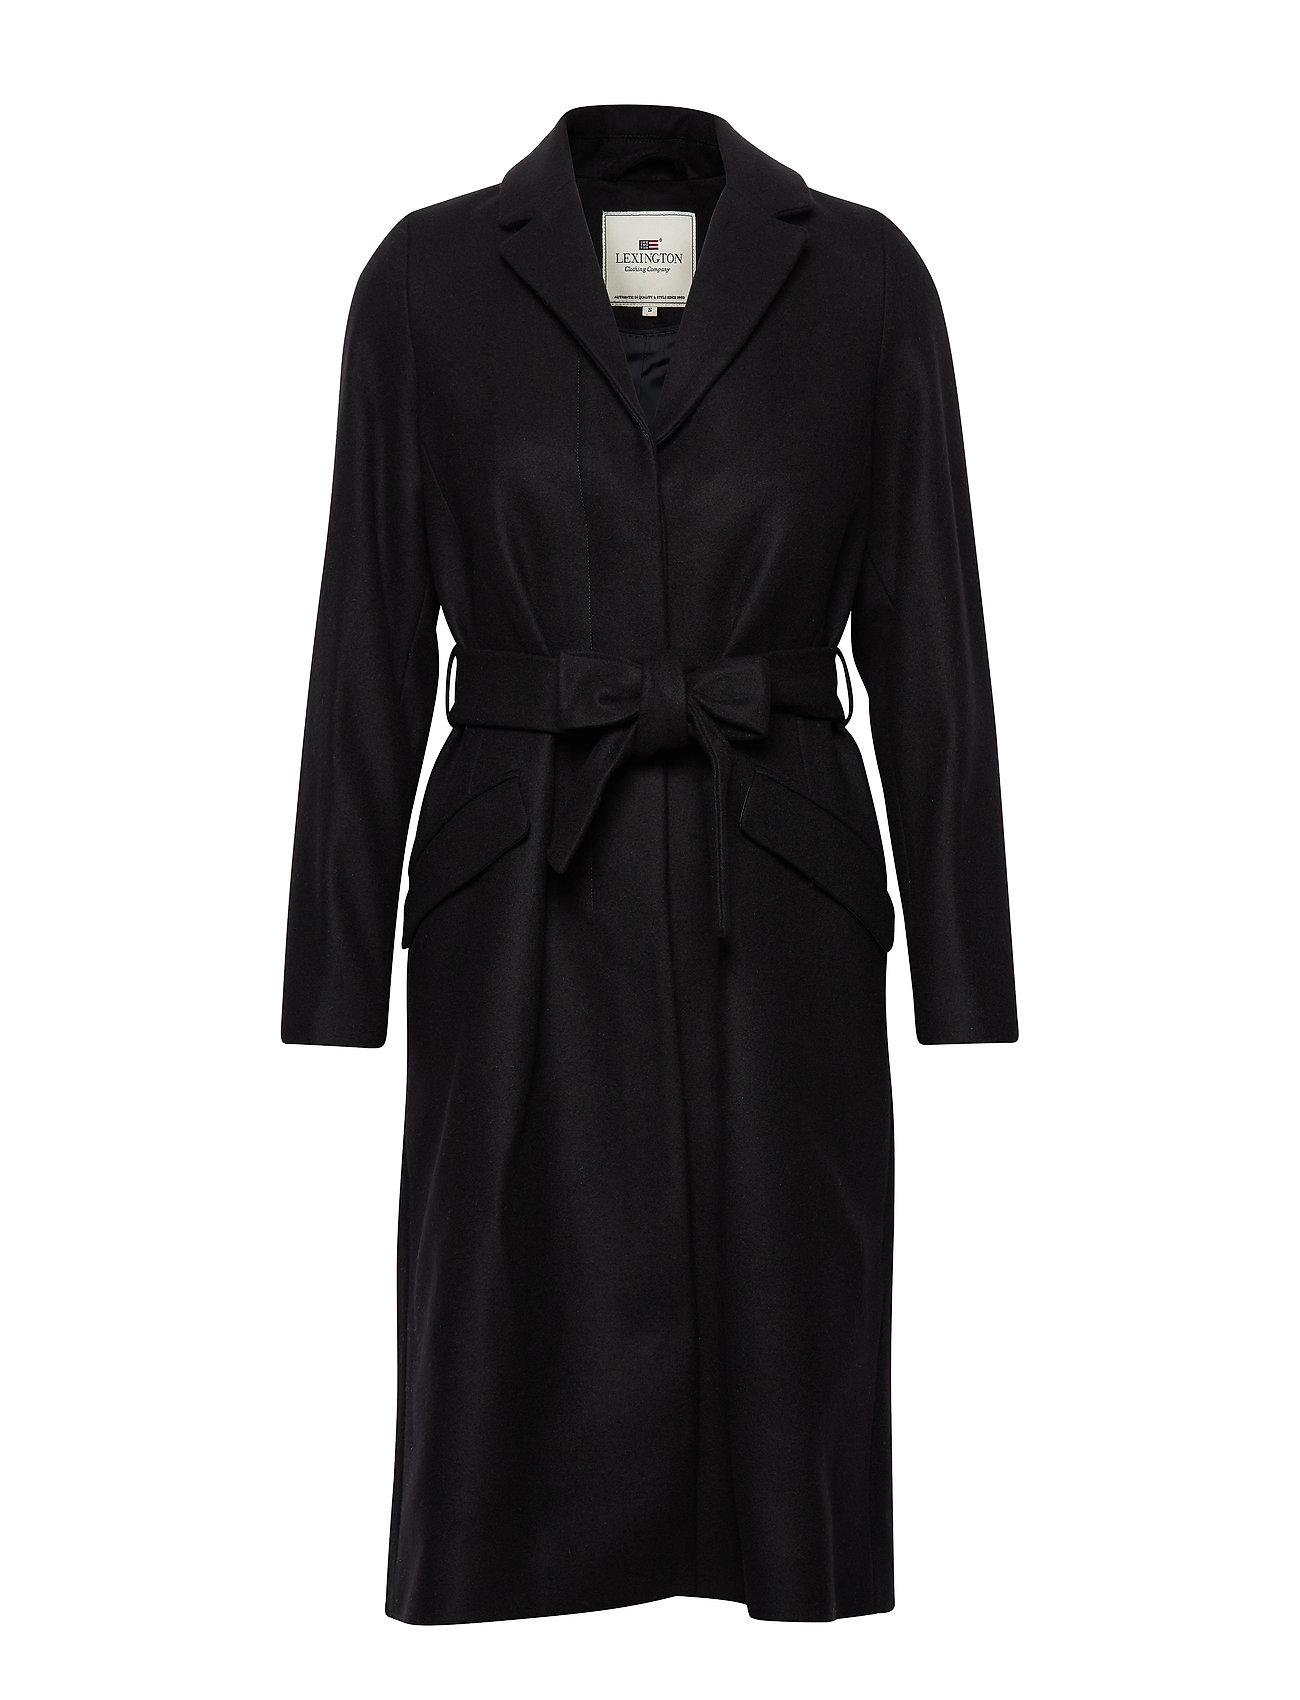 Lexington Clothing Heather Coat - BLACK